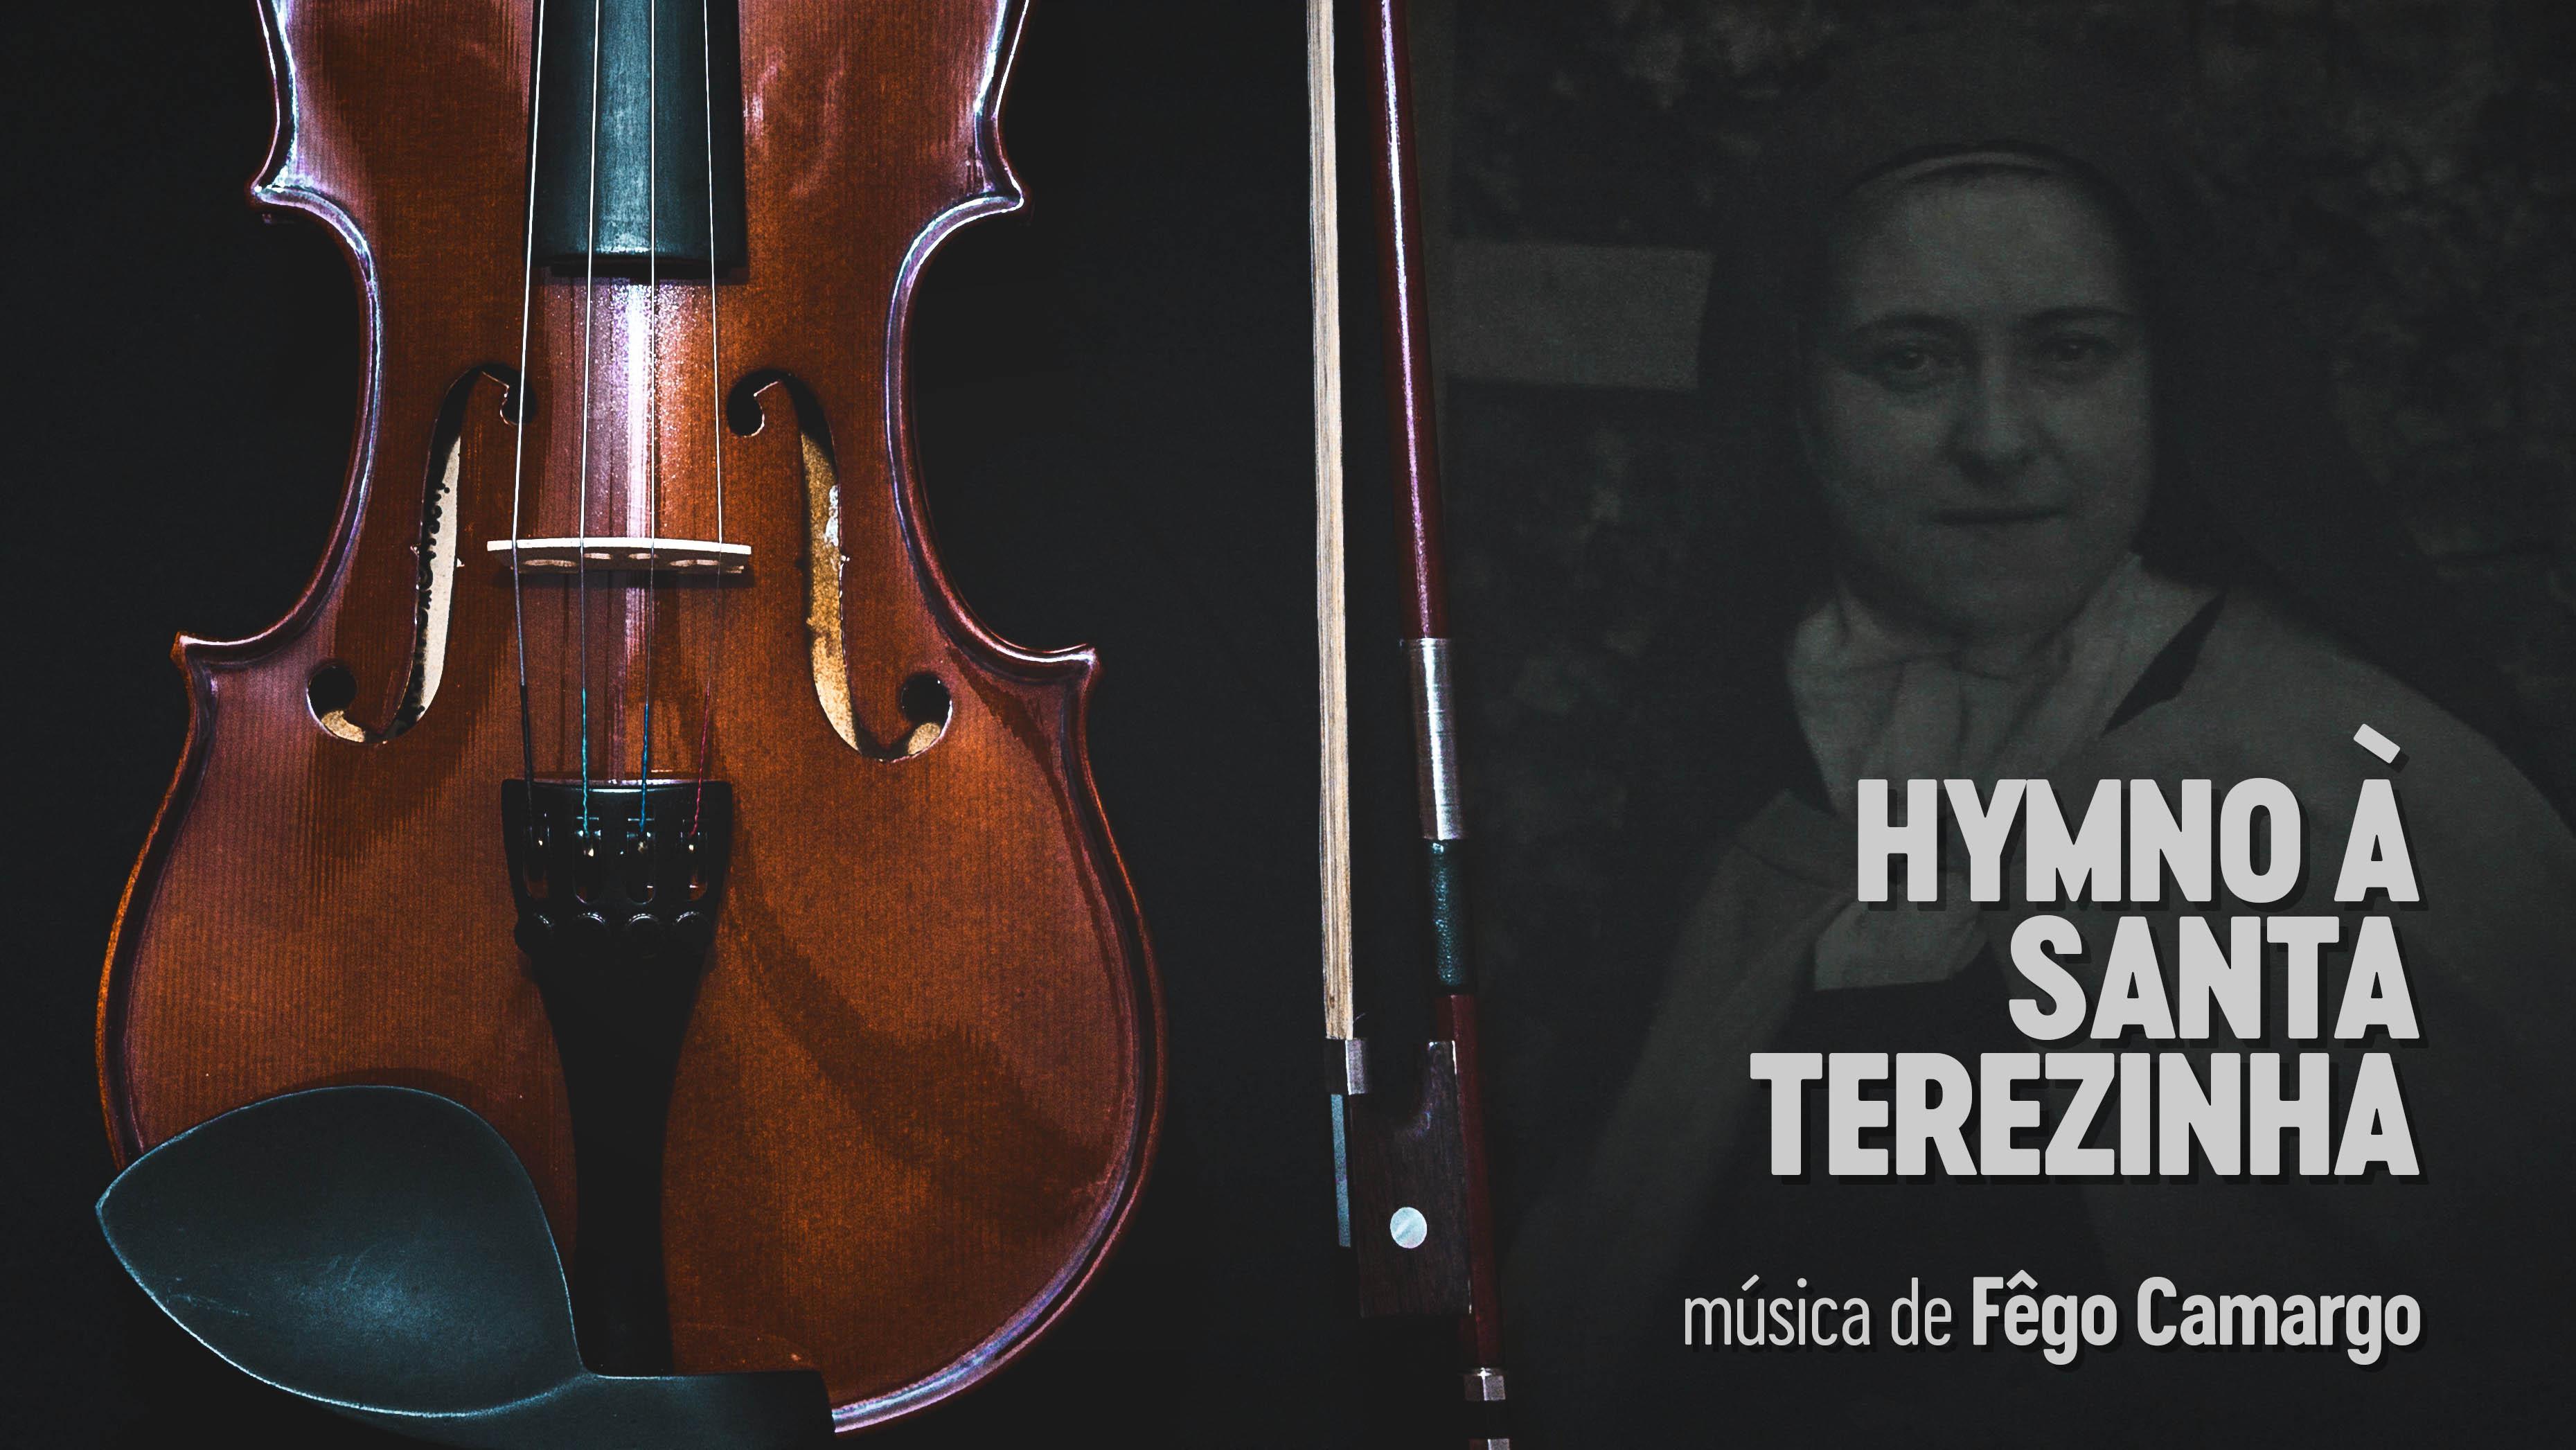 Hymno À Santa Terezinha